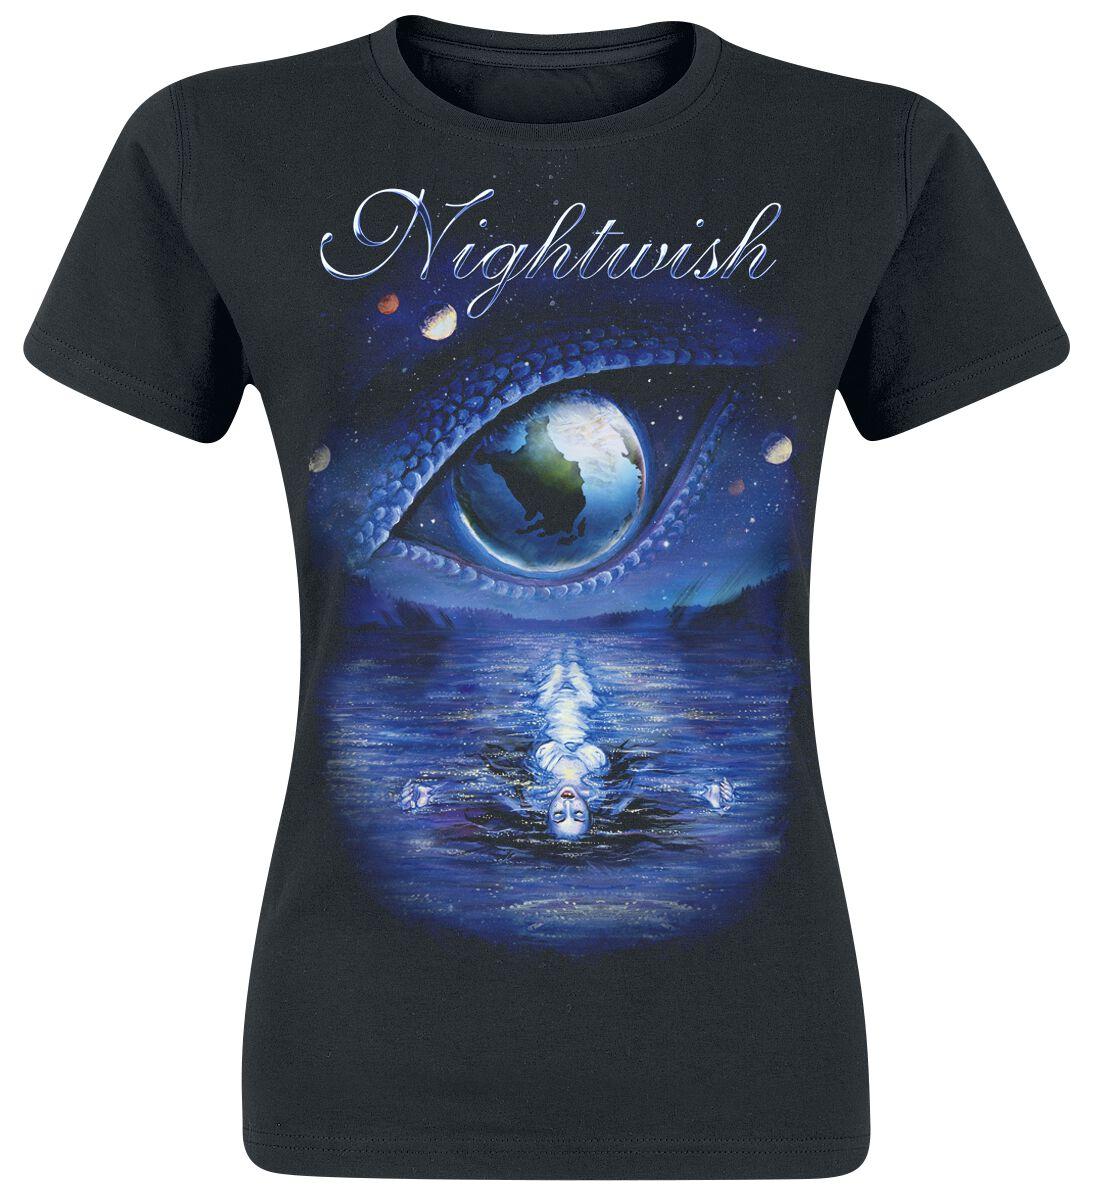 Nightwish Oceanborn - Decades Koszulka damska czarny